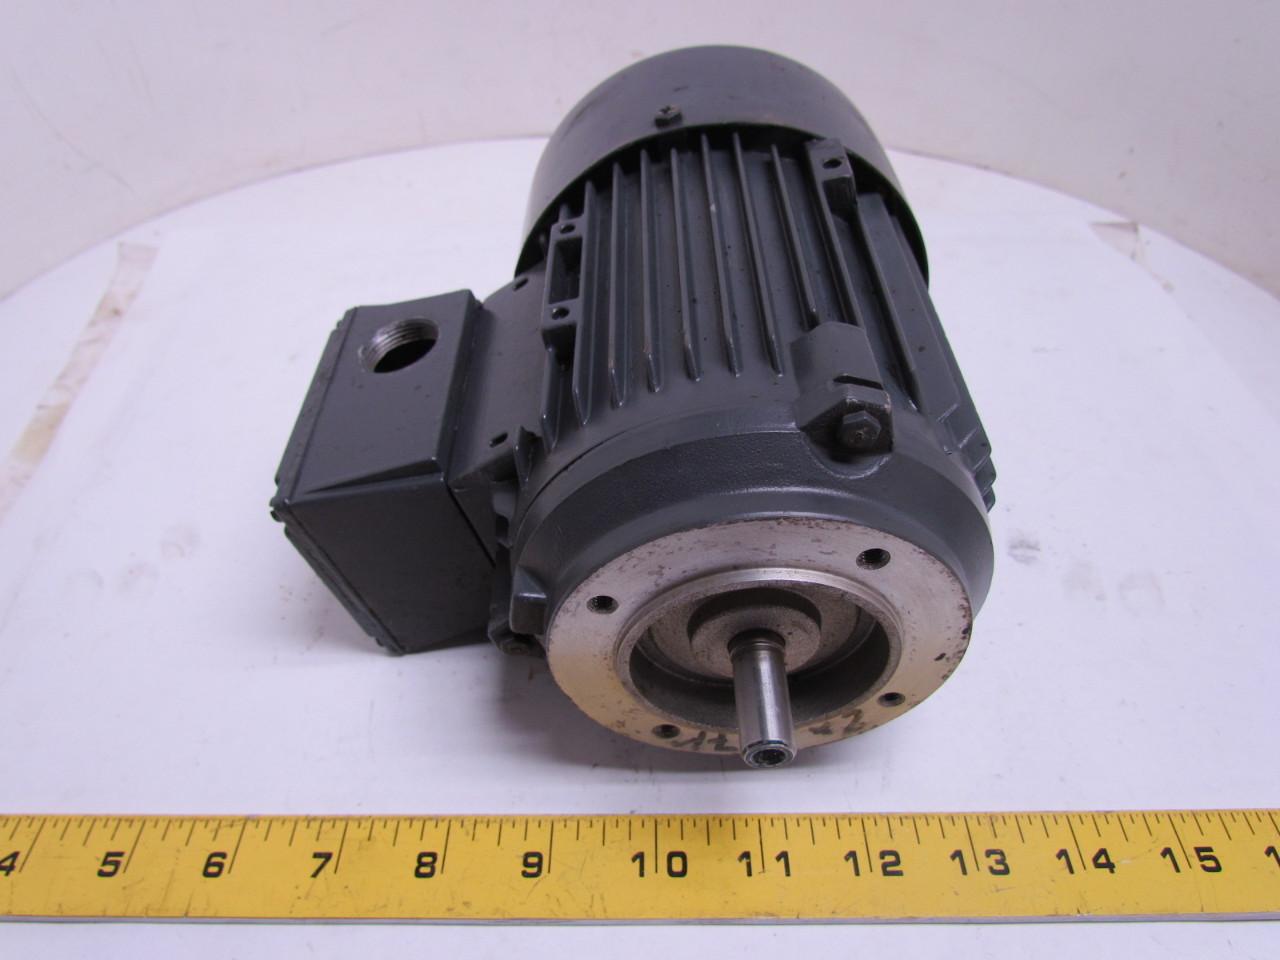 Siemens 2cw5 167 1 z d363 1892 01 iec 63 frame motor for Iec motor frame size